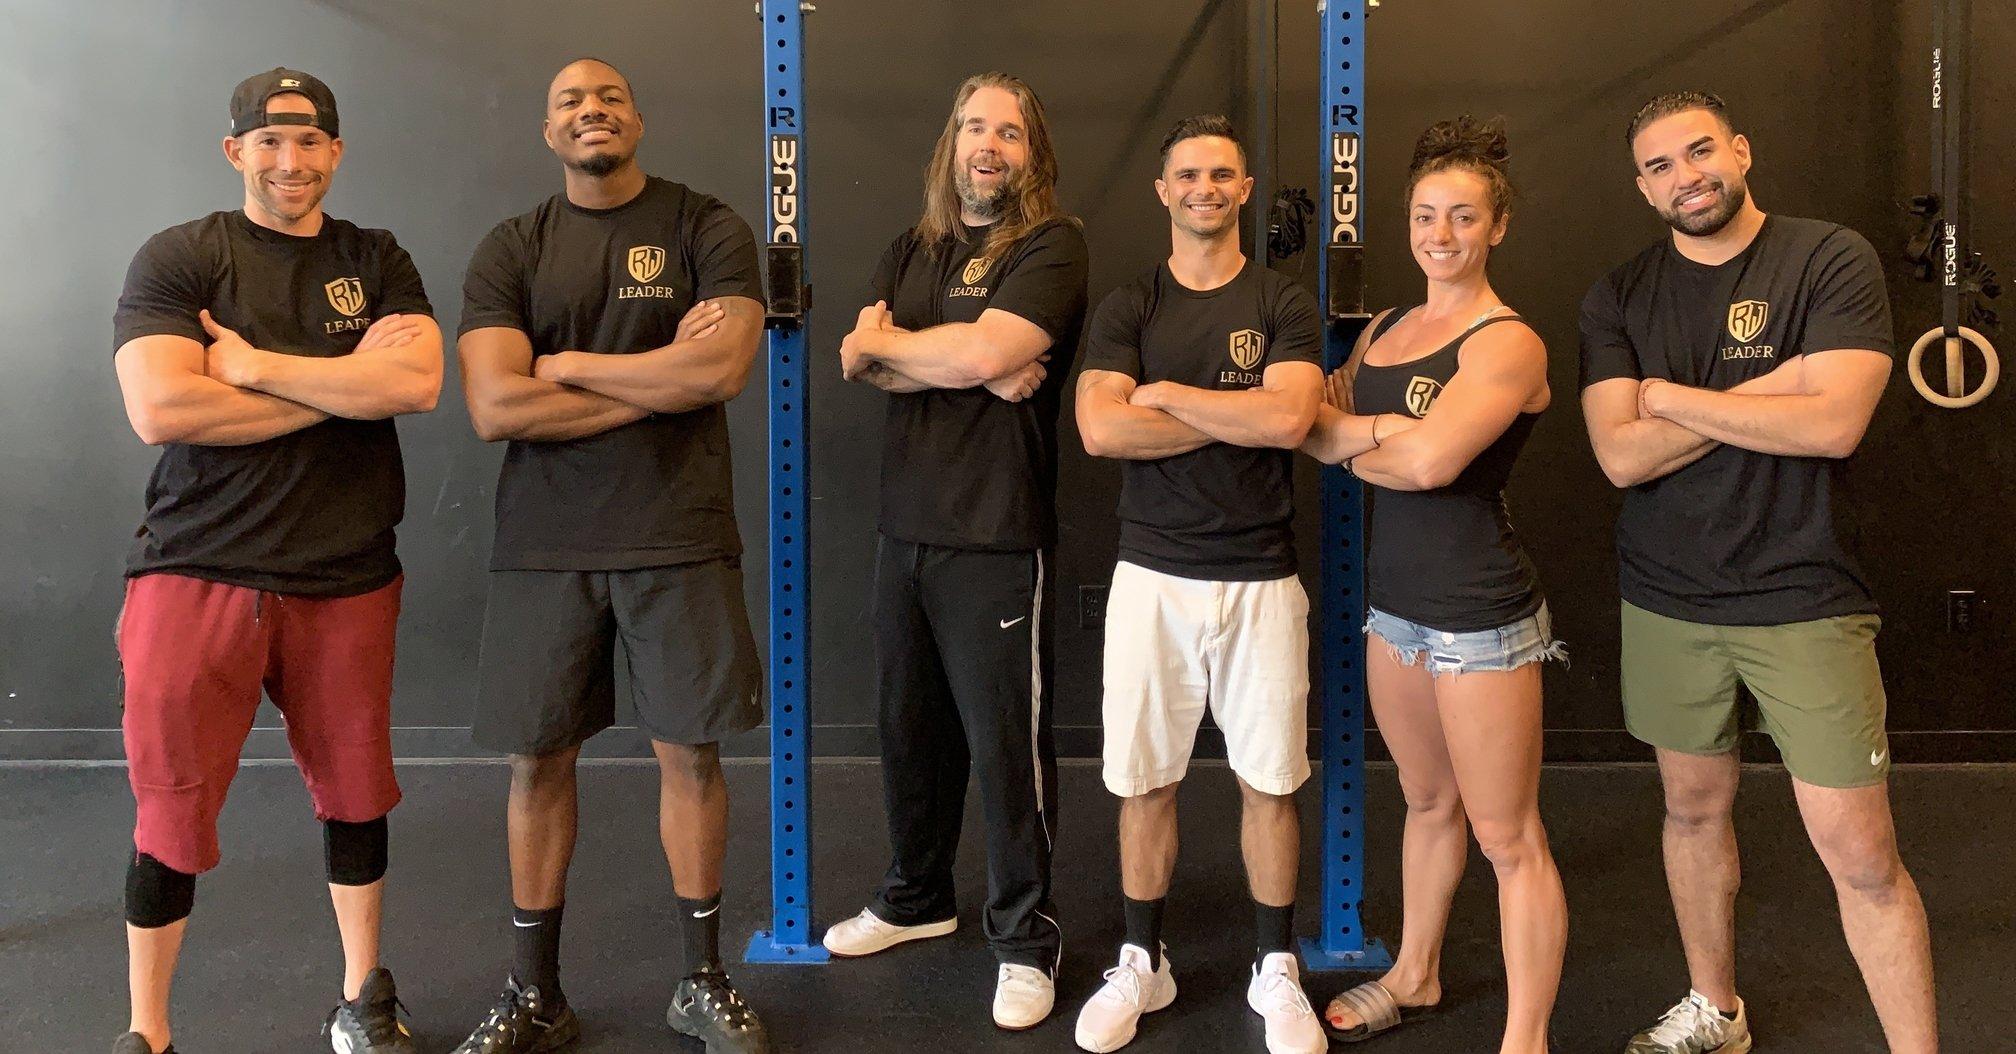 The Relentless Warrior Team